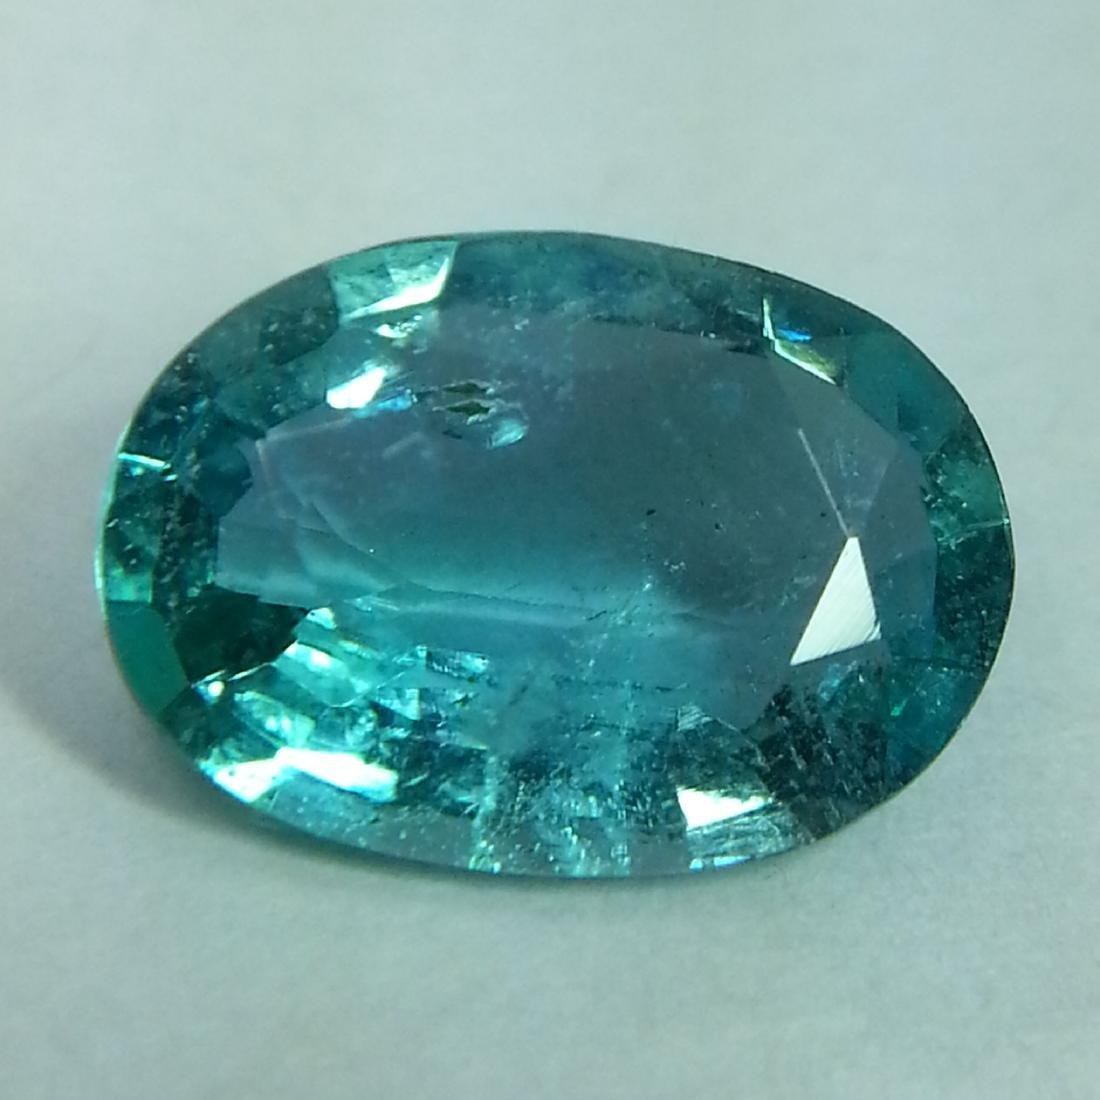 Emerald - 1.16 ct